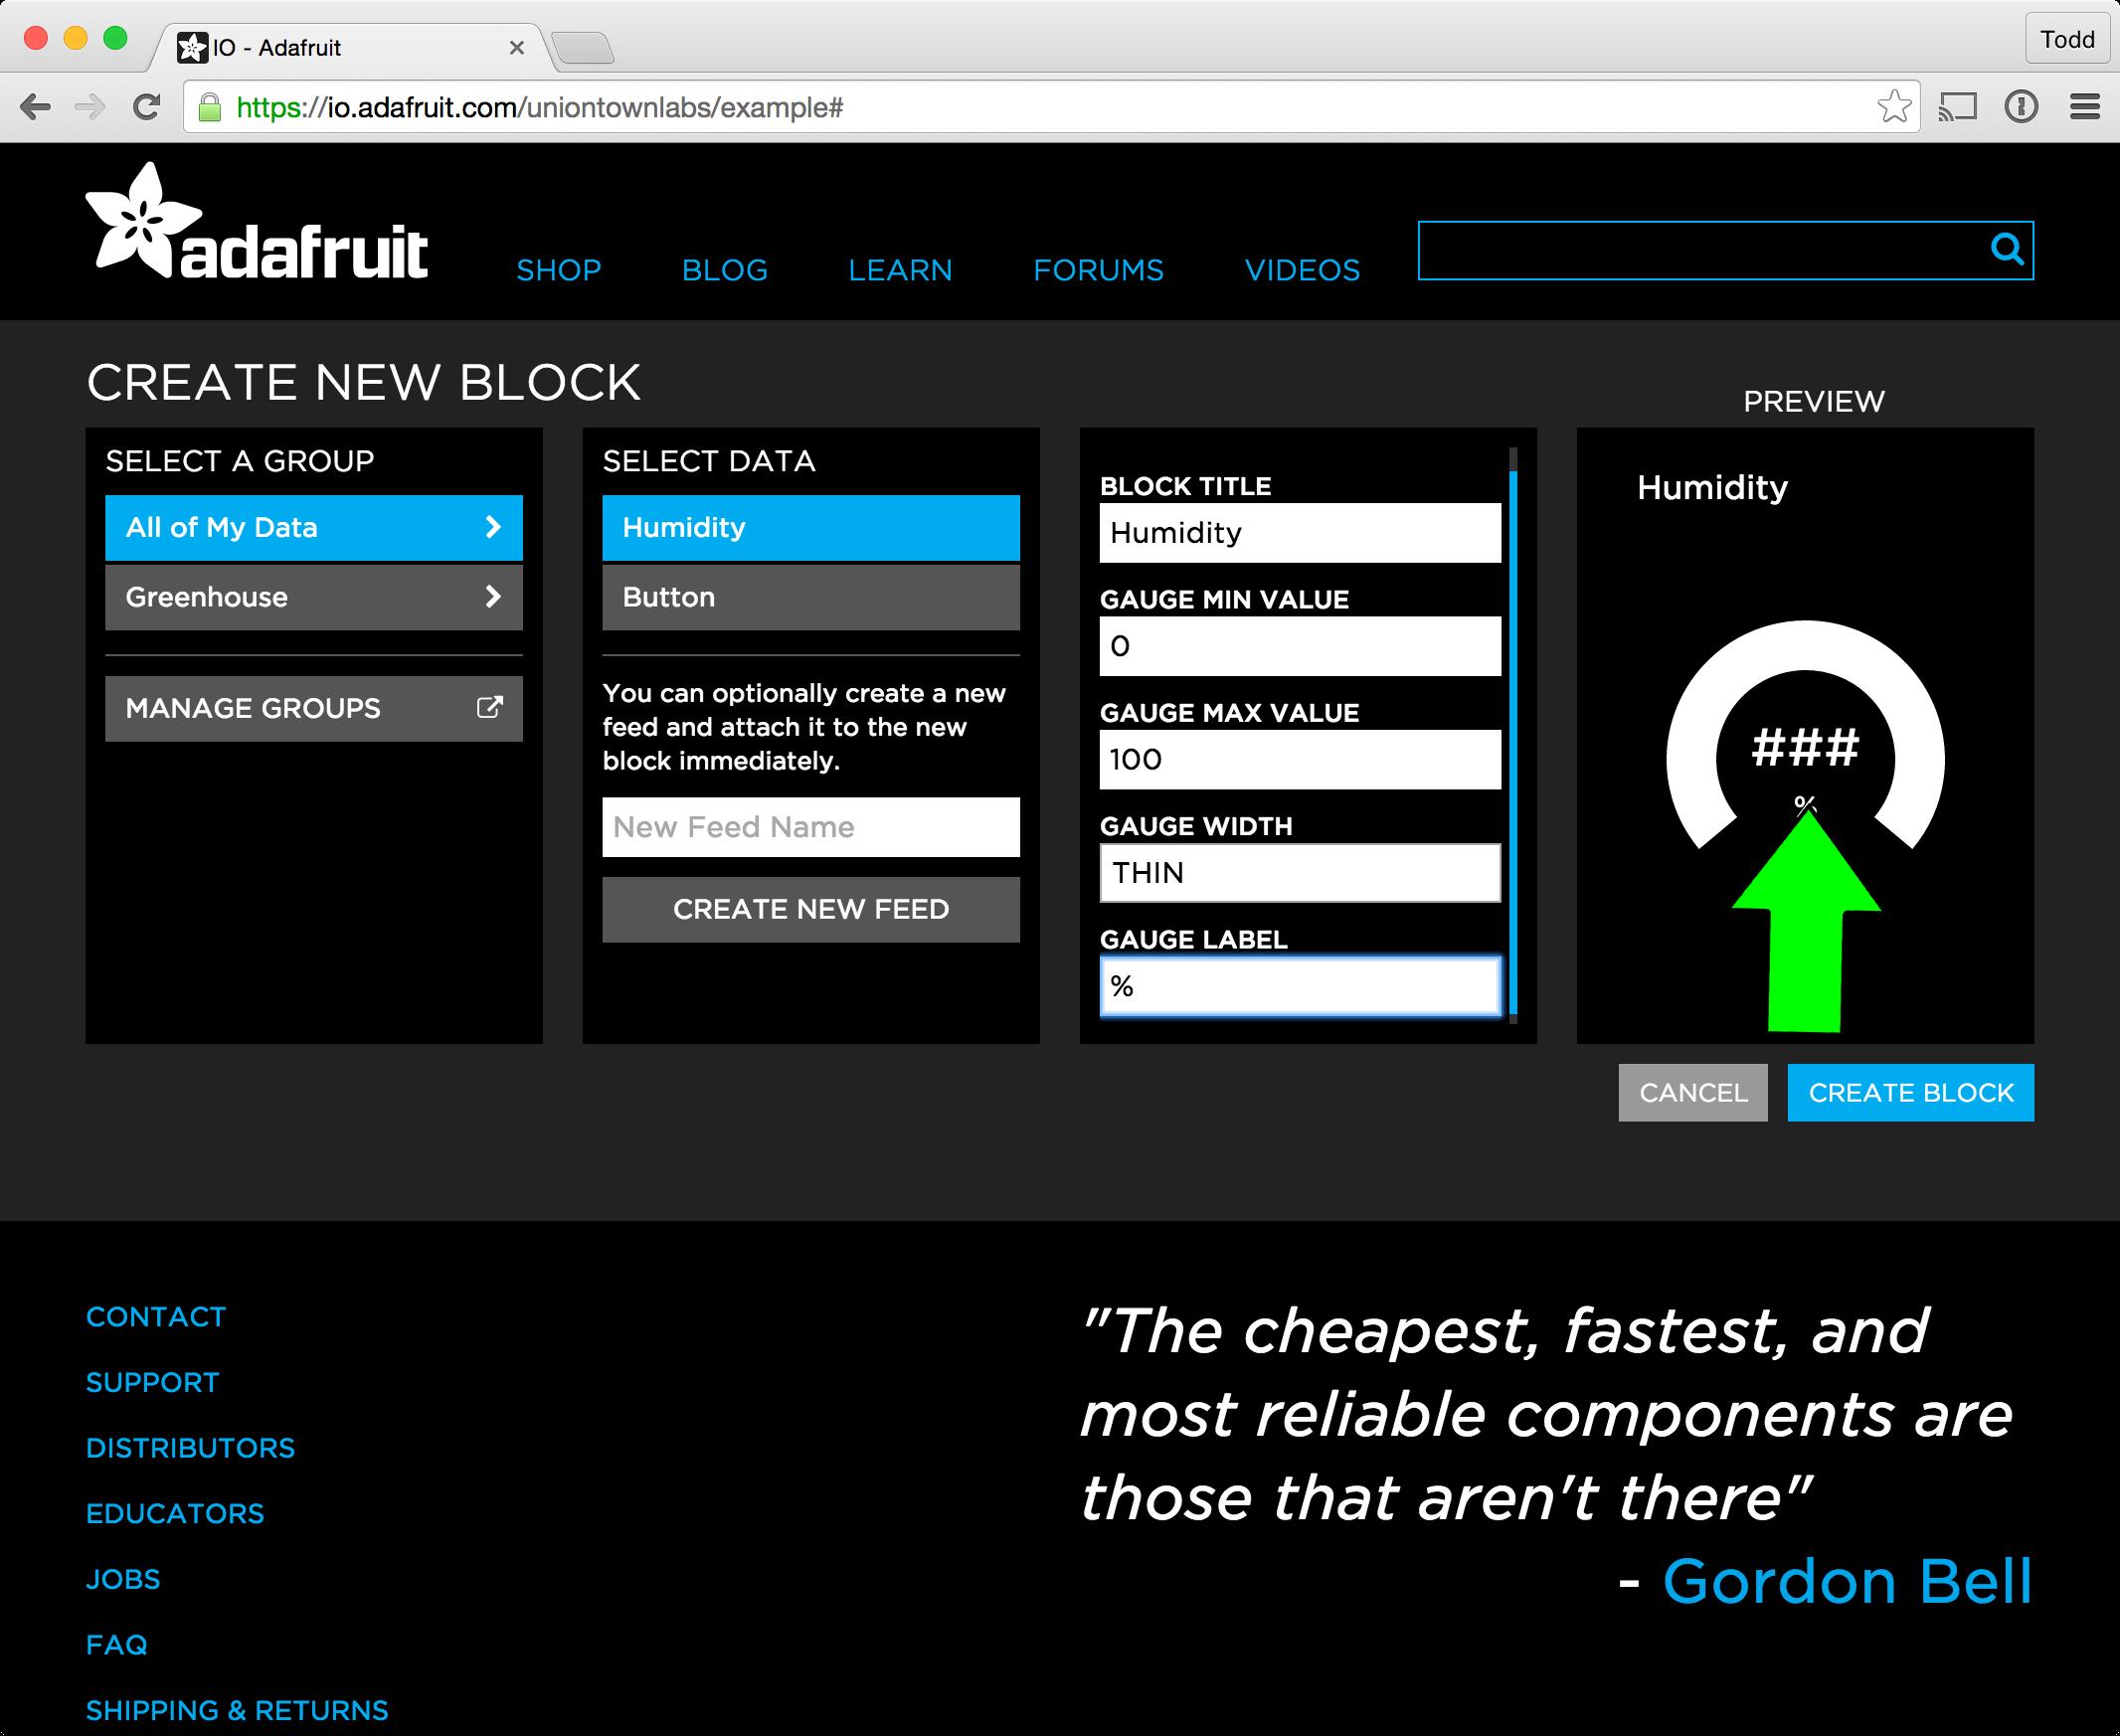 adafruit_io_new_block5.png